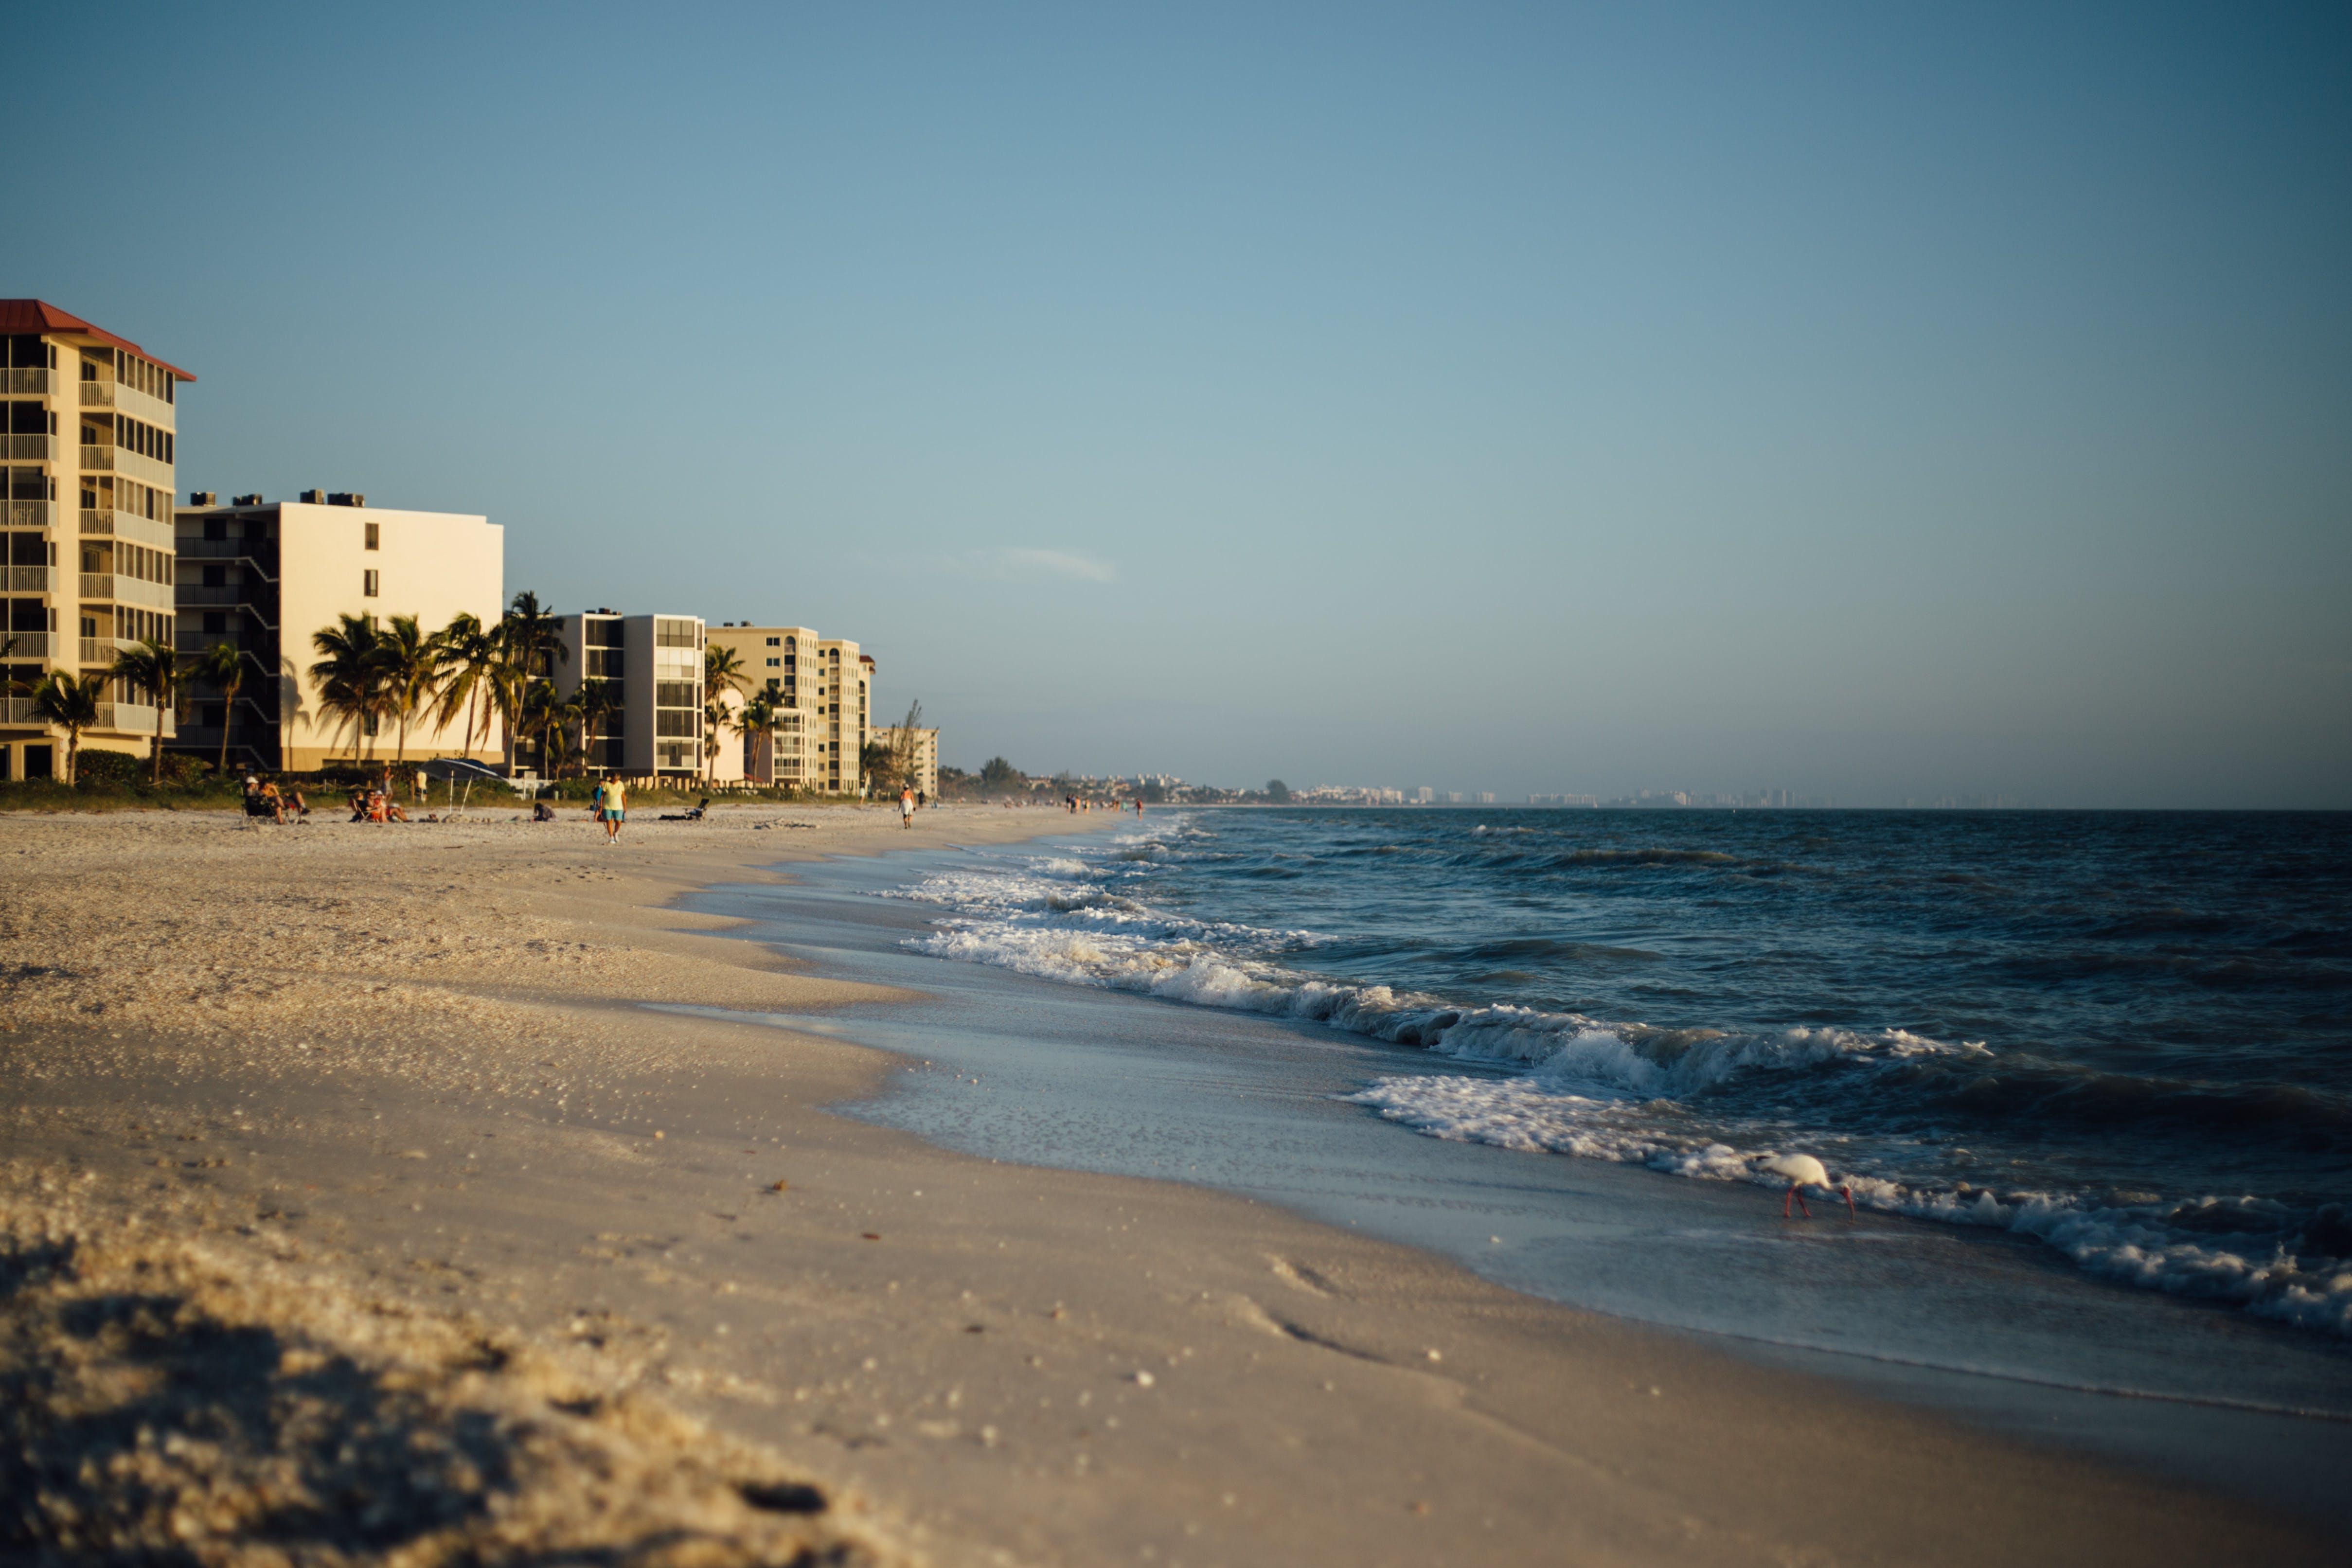 beach, city, ocean